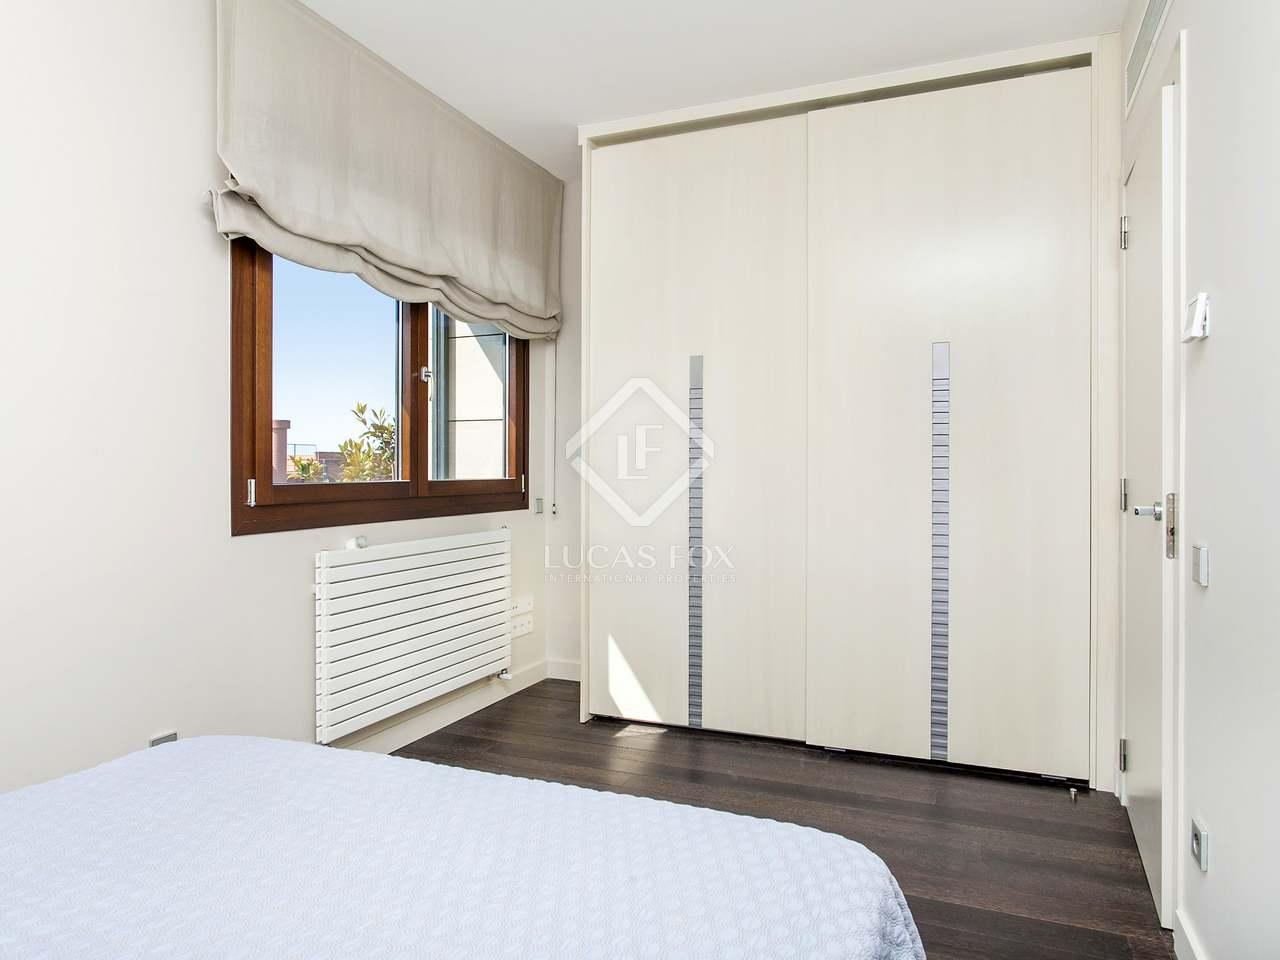 Casa de 5 dormitorios en alquiler en sarri bonanova for Casa con jardin alquiler barcelona